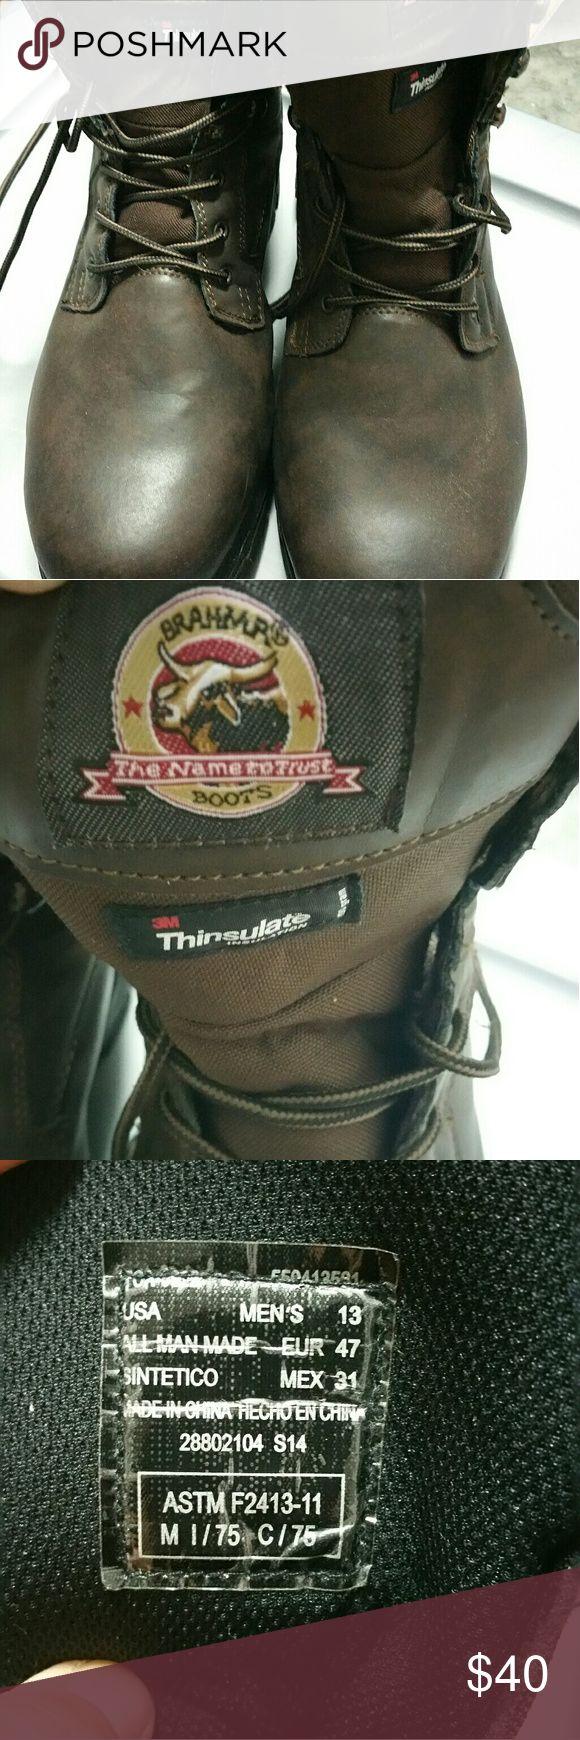 Men's 13 Brahma Brown steel Toe Boots Men's 13 Brahma Brown steel Toe Boots. 3m Thinsulate Insulation. Worn 2 times. Above ankle boot. brahma Shoes Boots